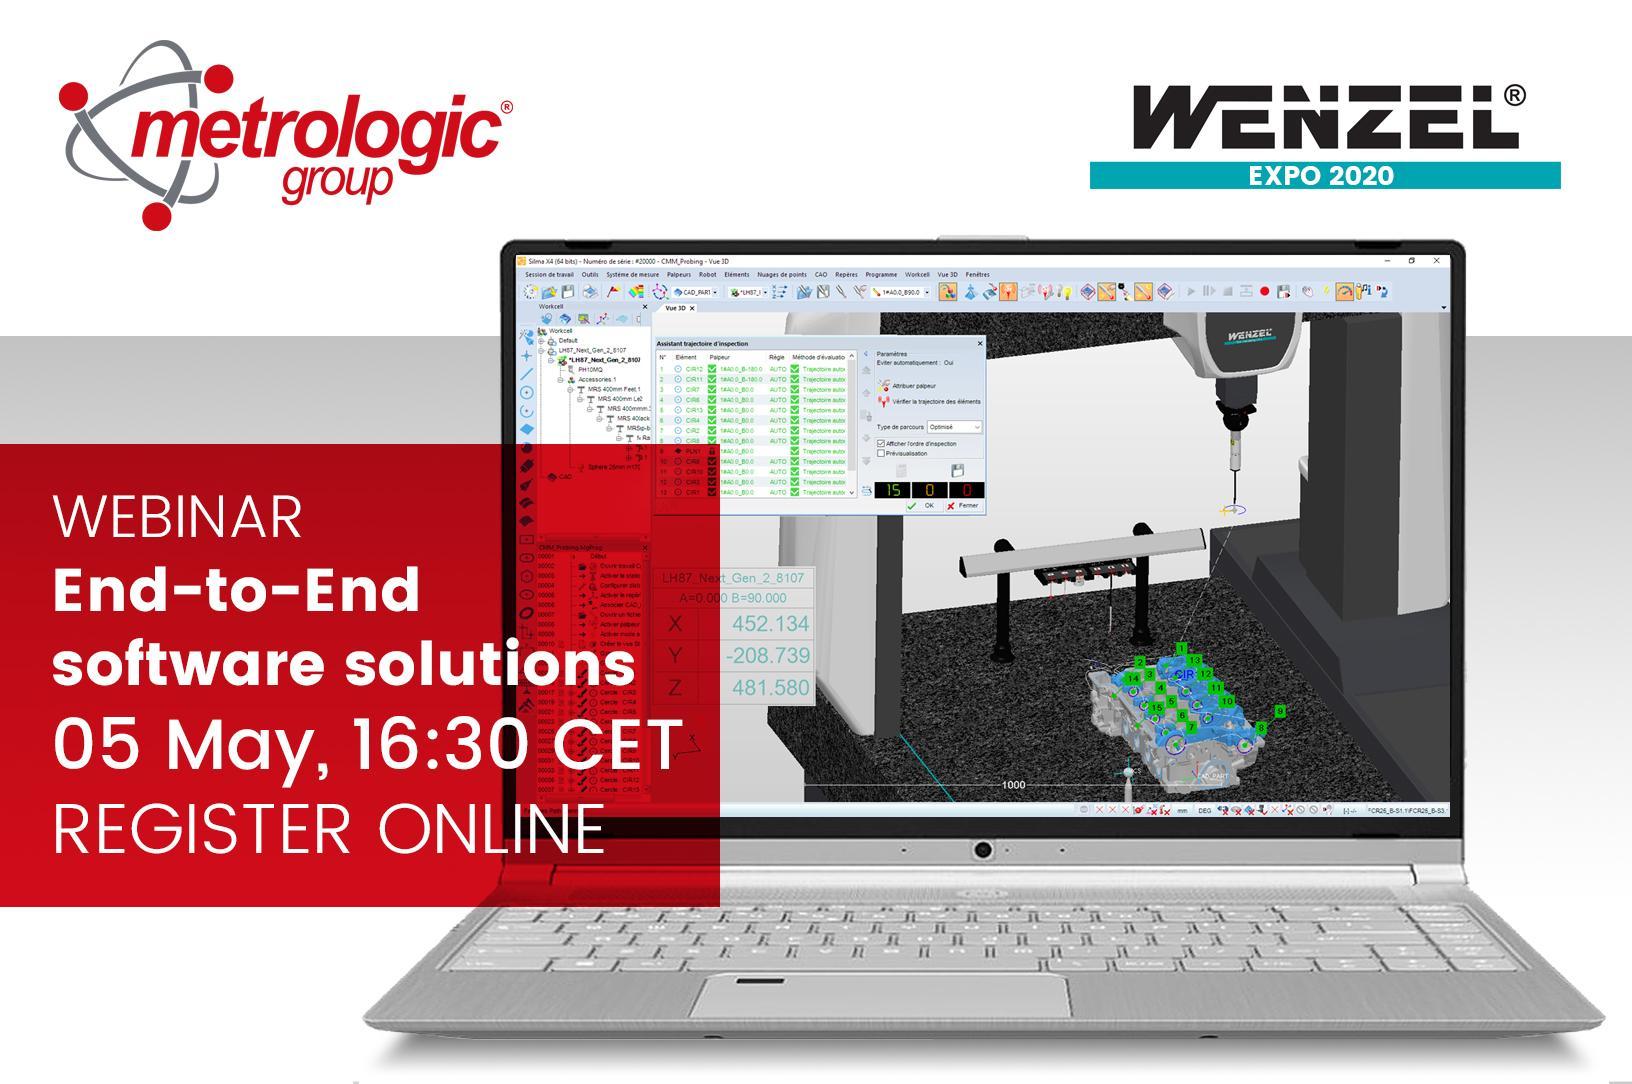 Join our WebinarduringWENZEL virtual fair 1